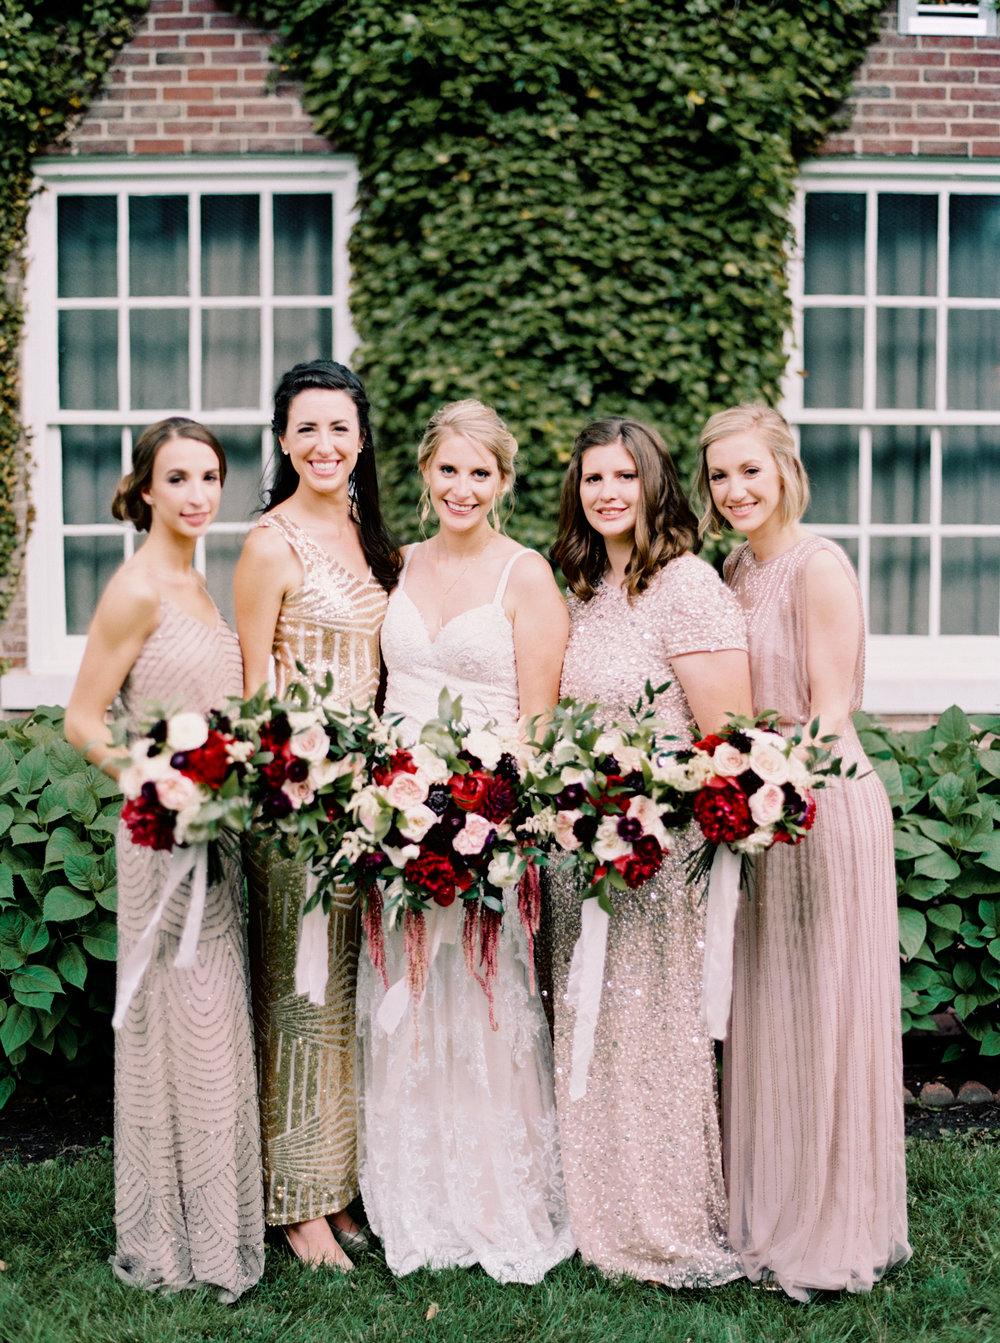 Courtney Inghram Wedding Florist Tidewater Inn Maryland Eastern Shore